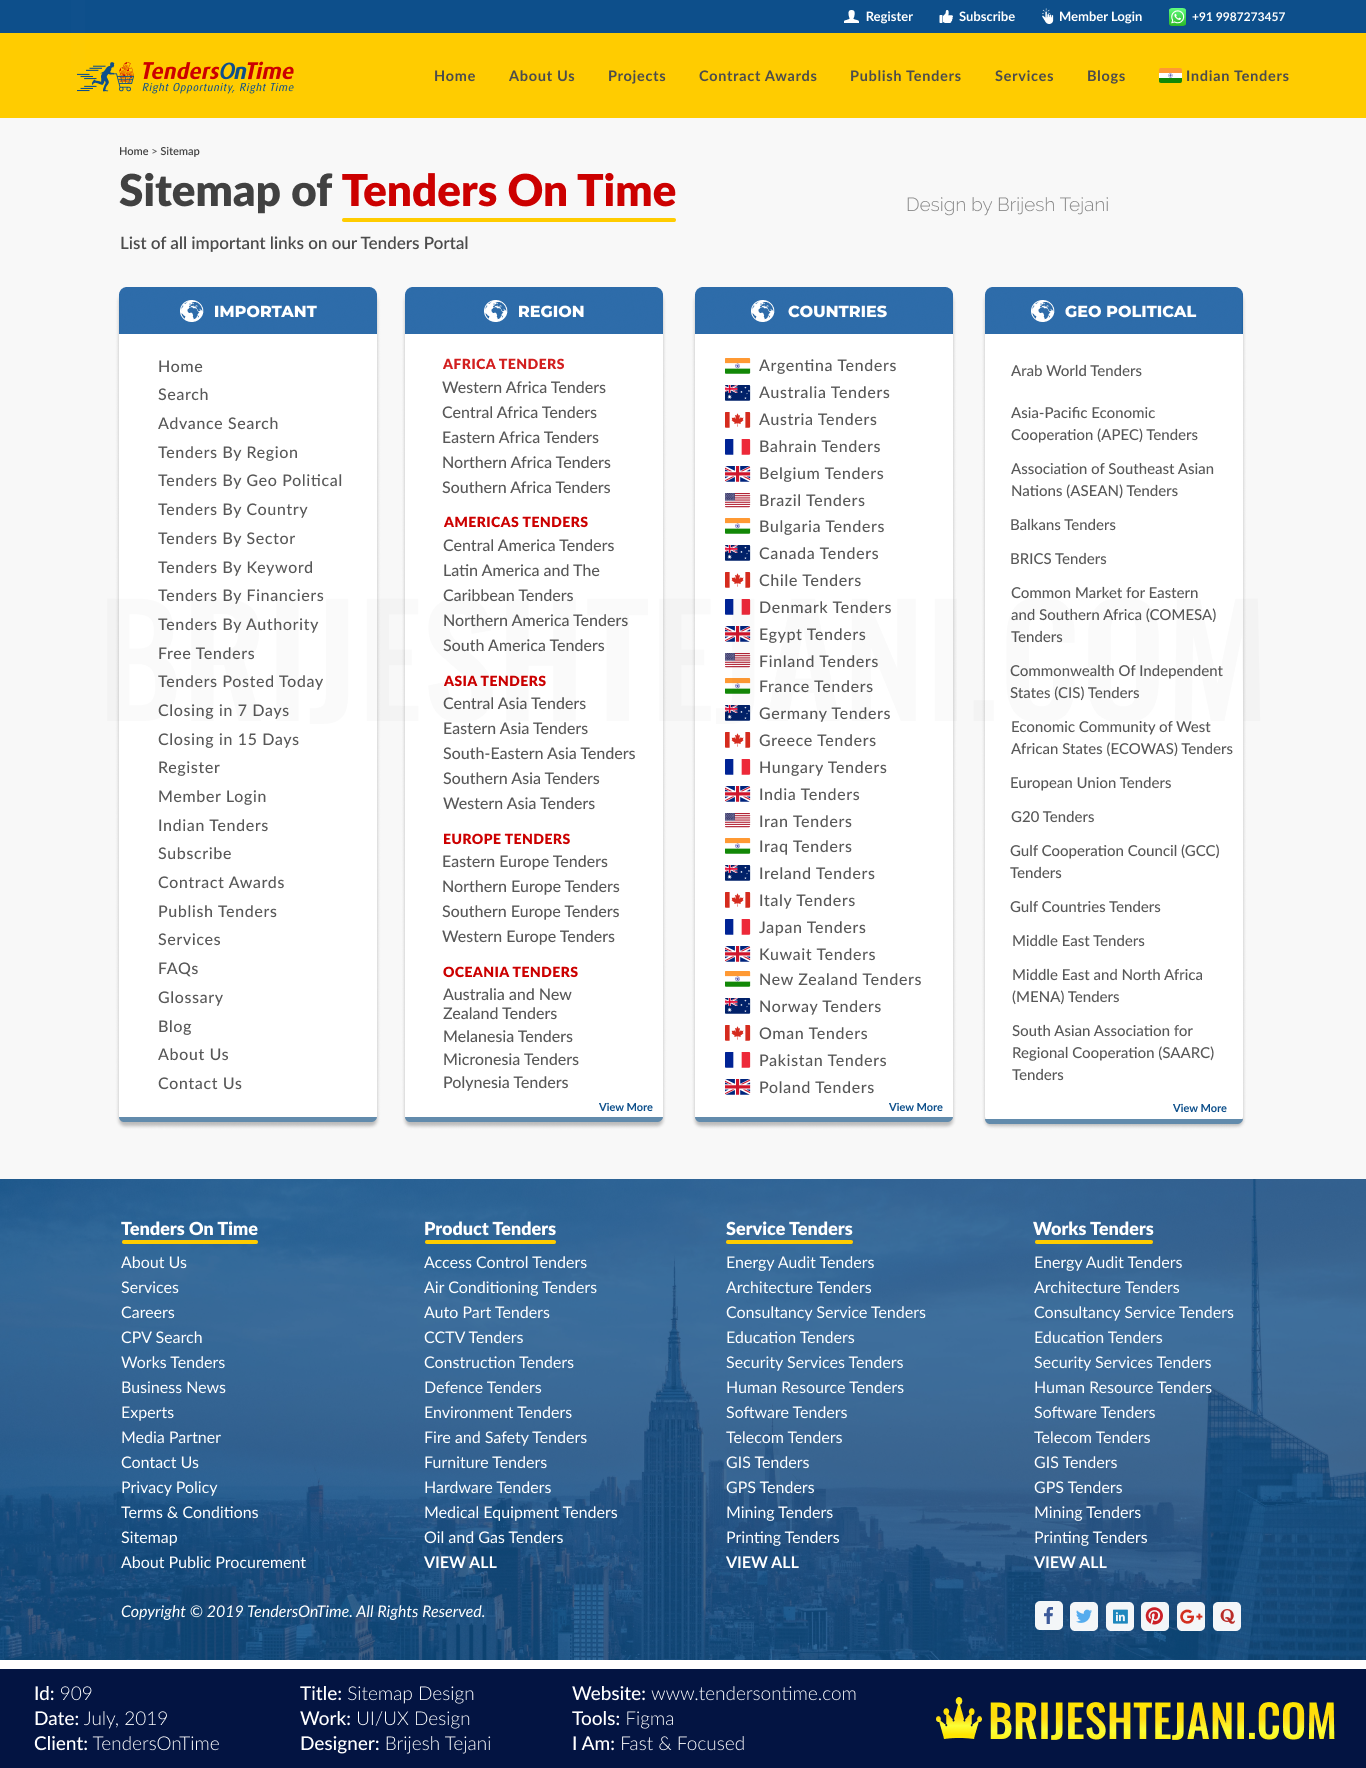 Sitemap of Tenders On Time | UI UX Design | Brijesh Tejani